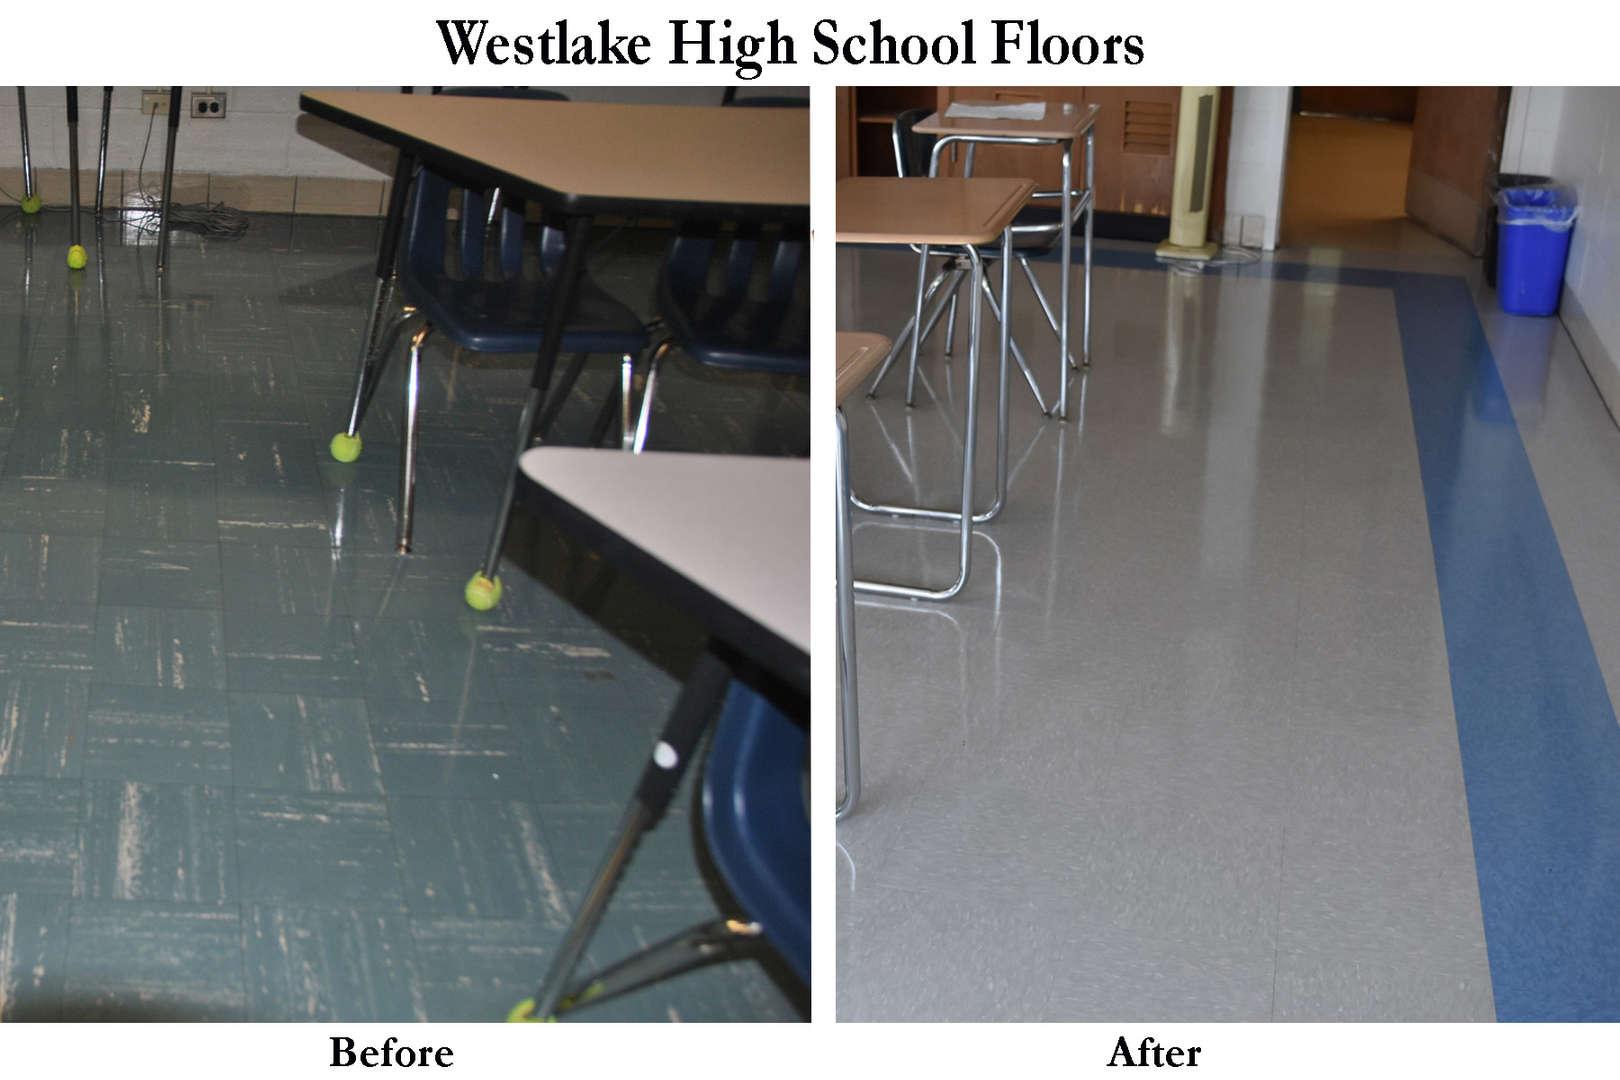 WHS floors